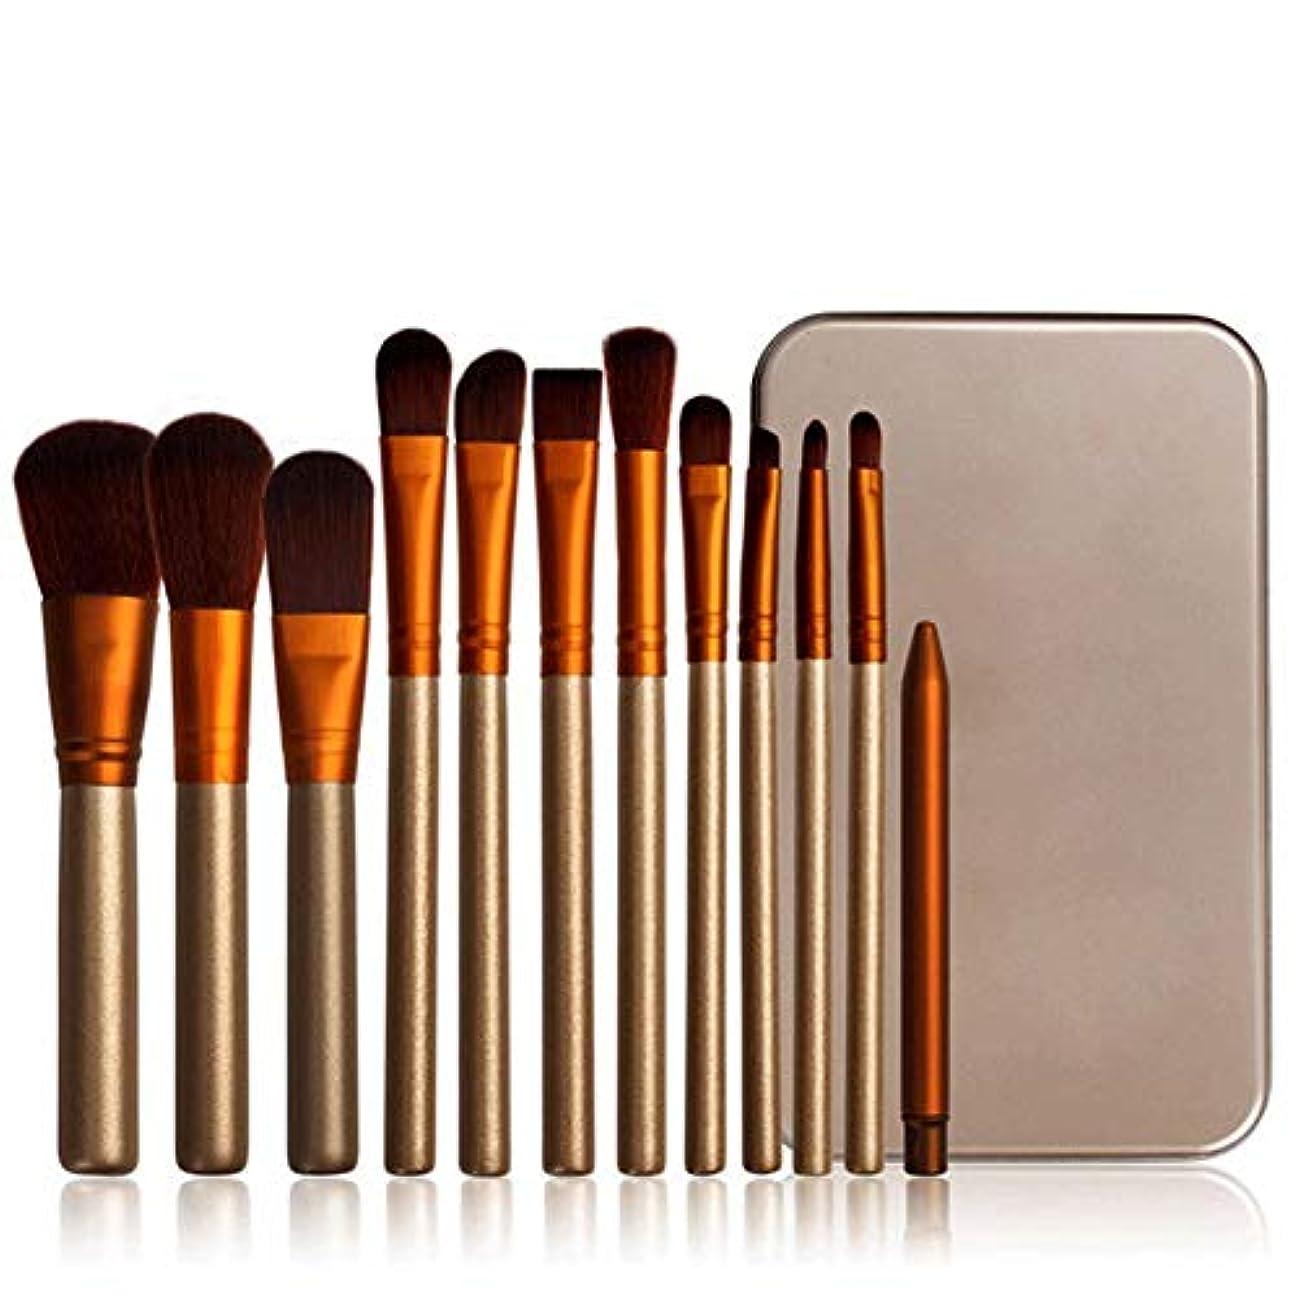 Rabugogo 12個/セットメイクブラシセットフェイス化粧品アイシャドウファンデーションブラッシュブラシ